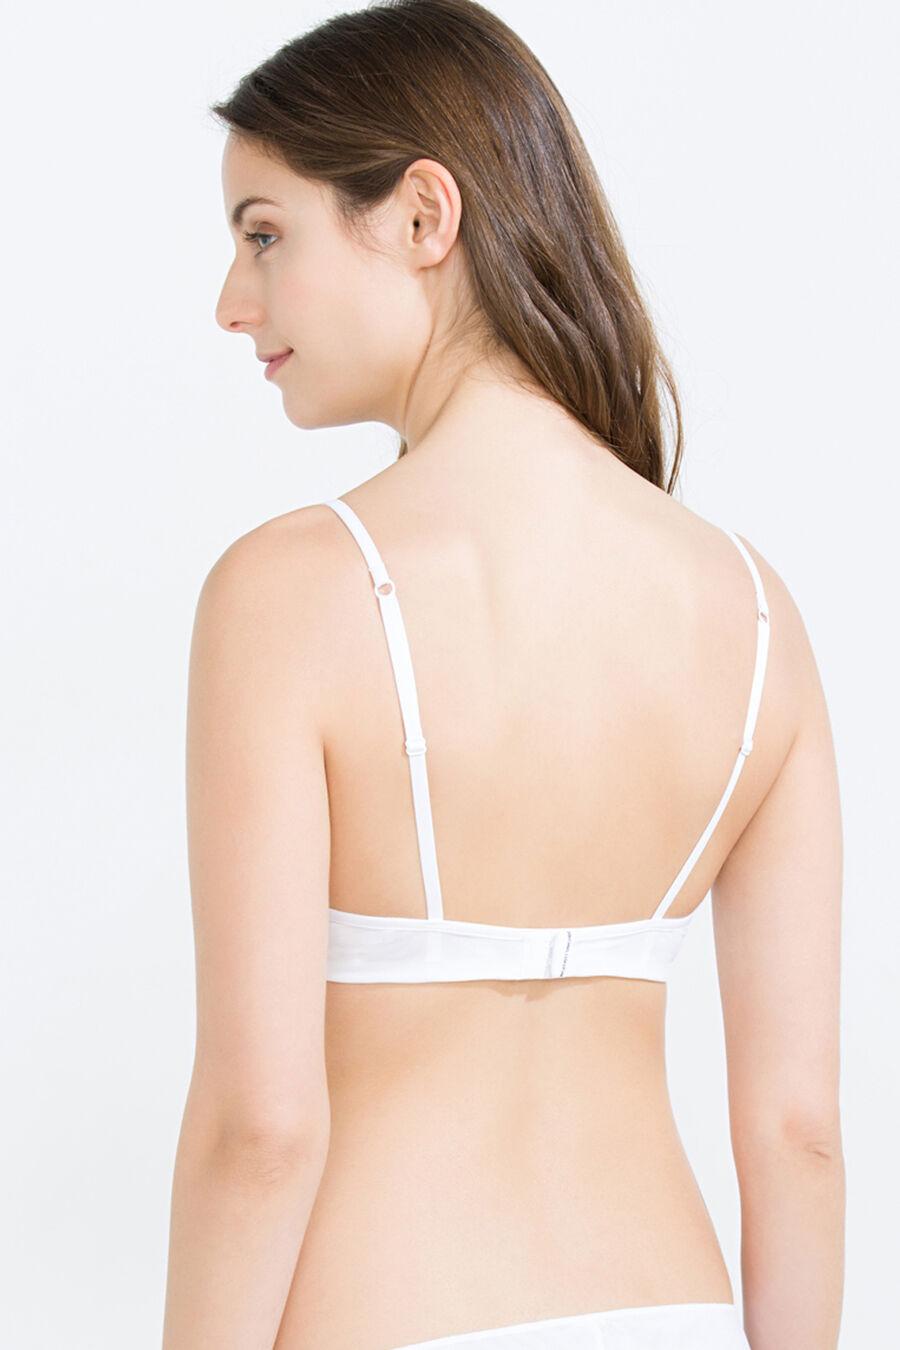 Underwire padded bra